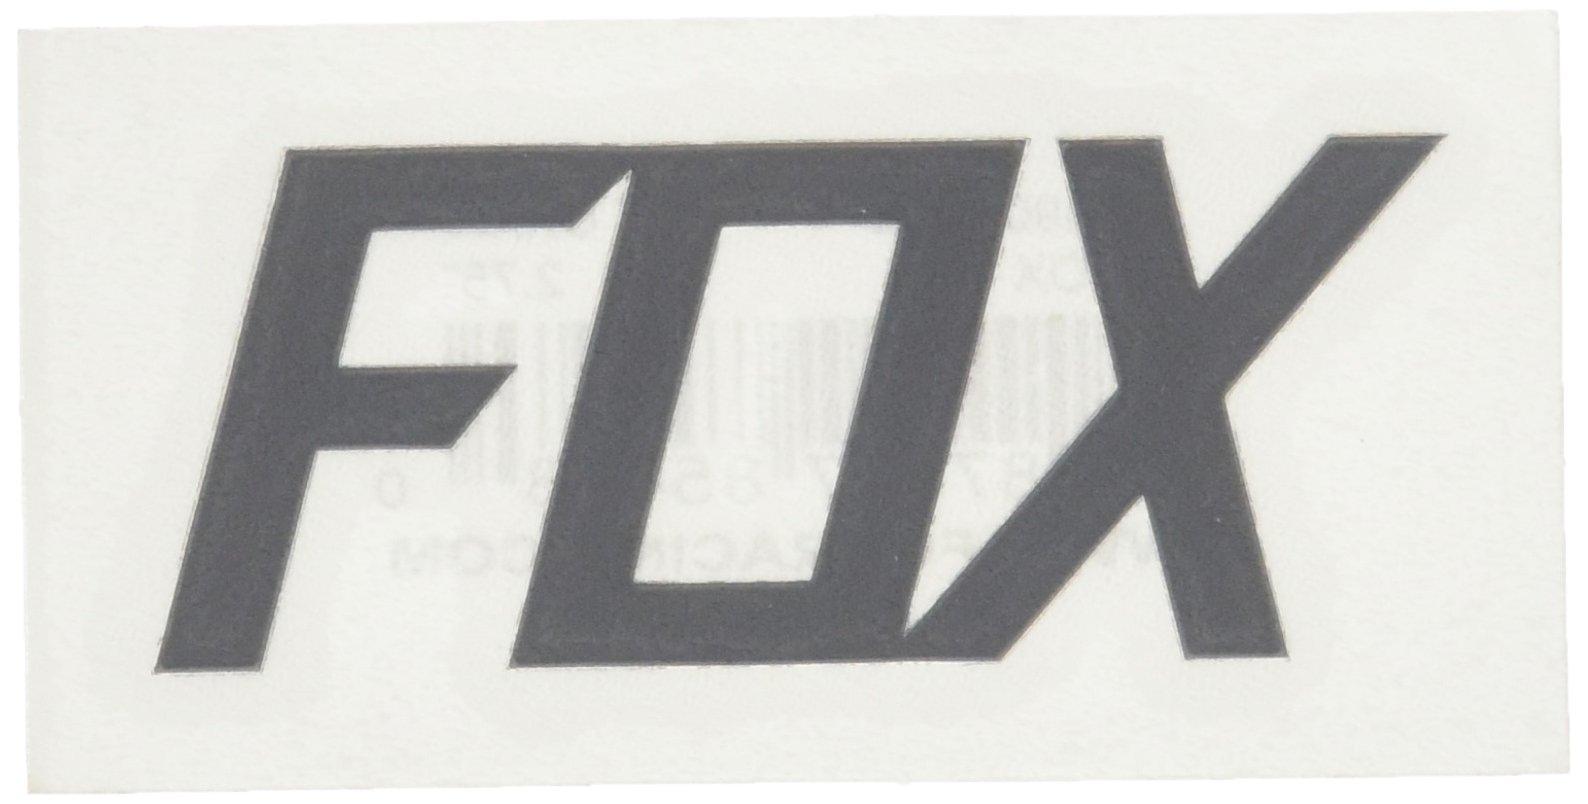 Fox Men's TDC-2.75'' Sticker, Mt Charcoal One Size